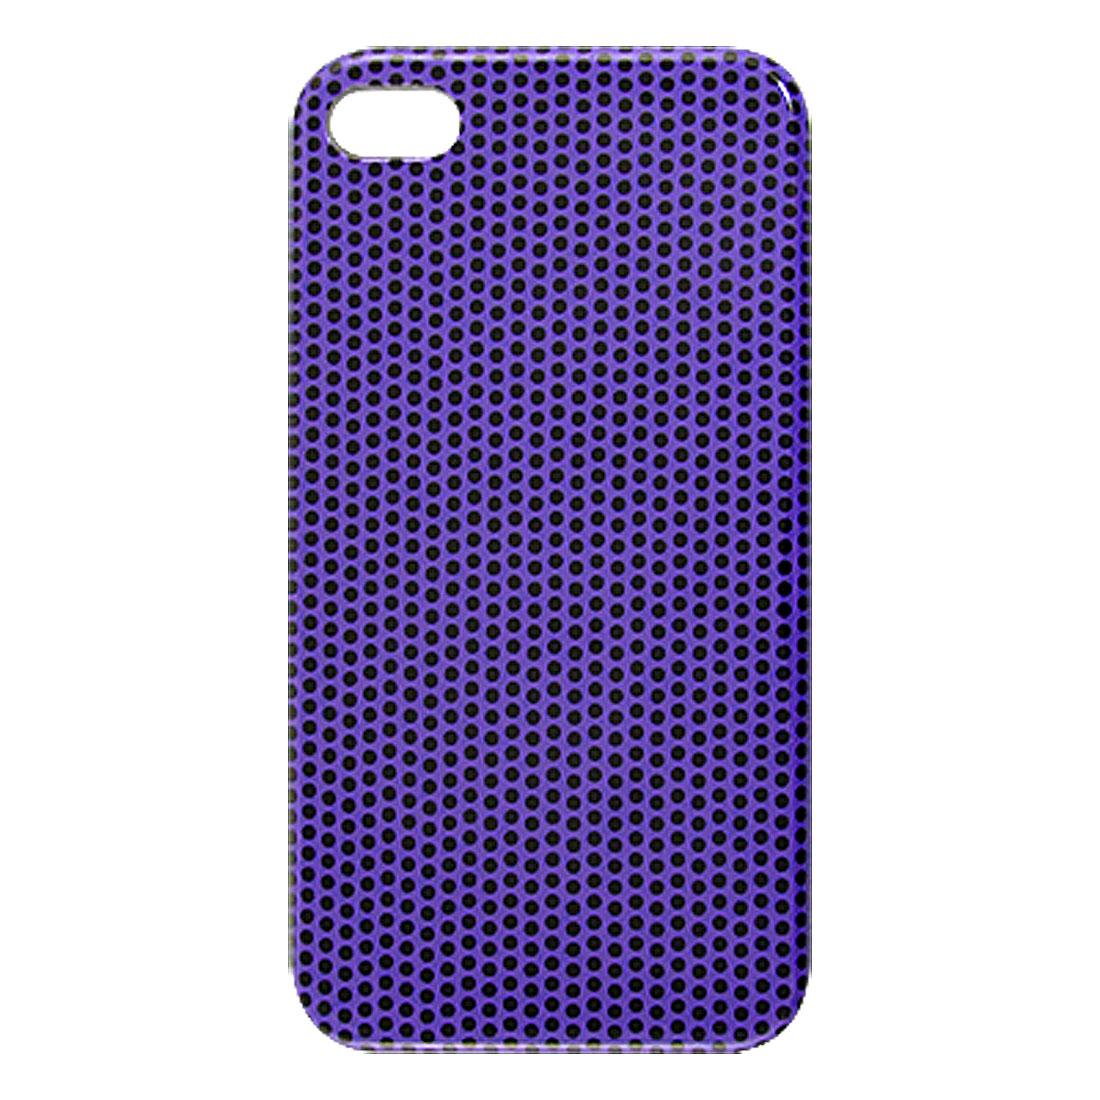 Black Dot Pattern Purple Hard Plastic IMD Back Case for Apple iPhone 4 4G 4S